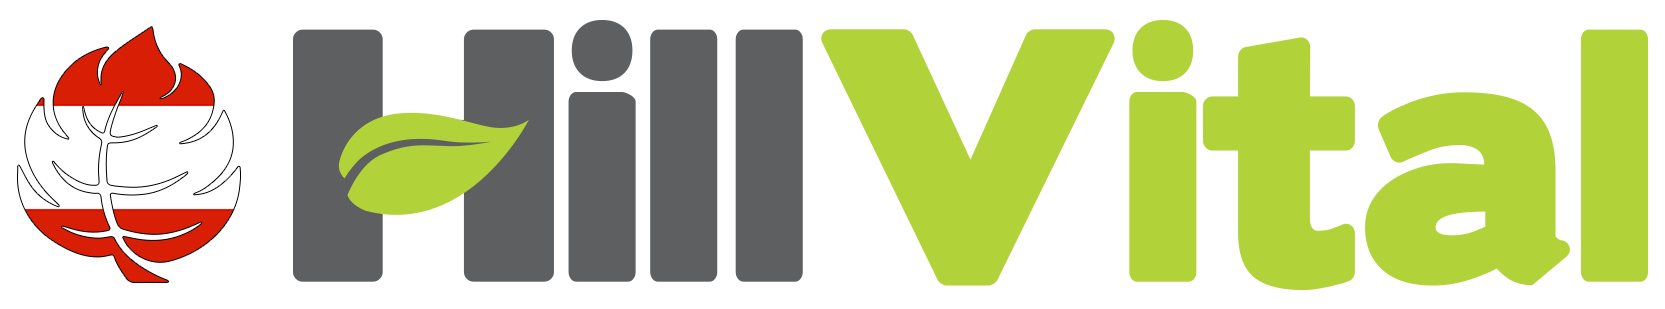 HillVital AT partner és forgalmazó